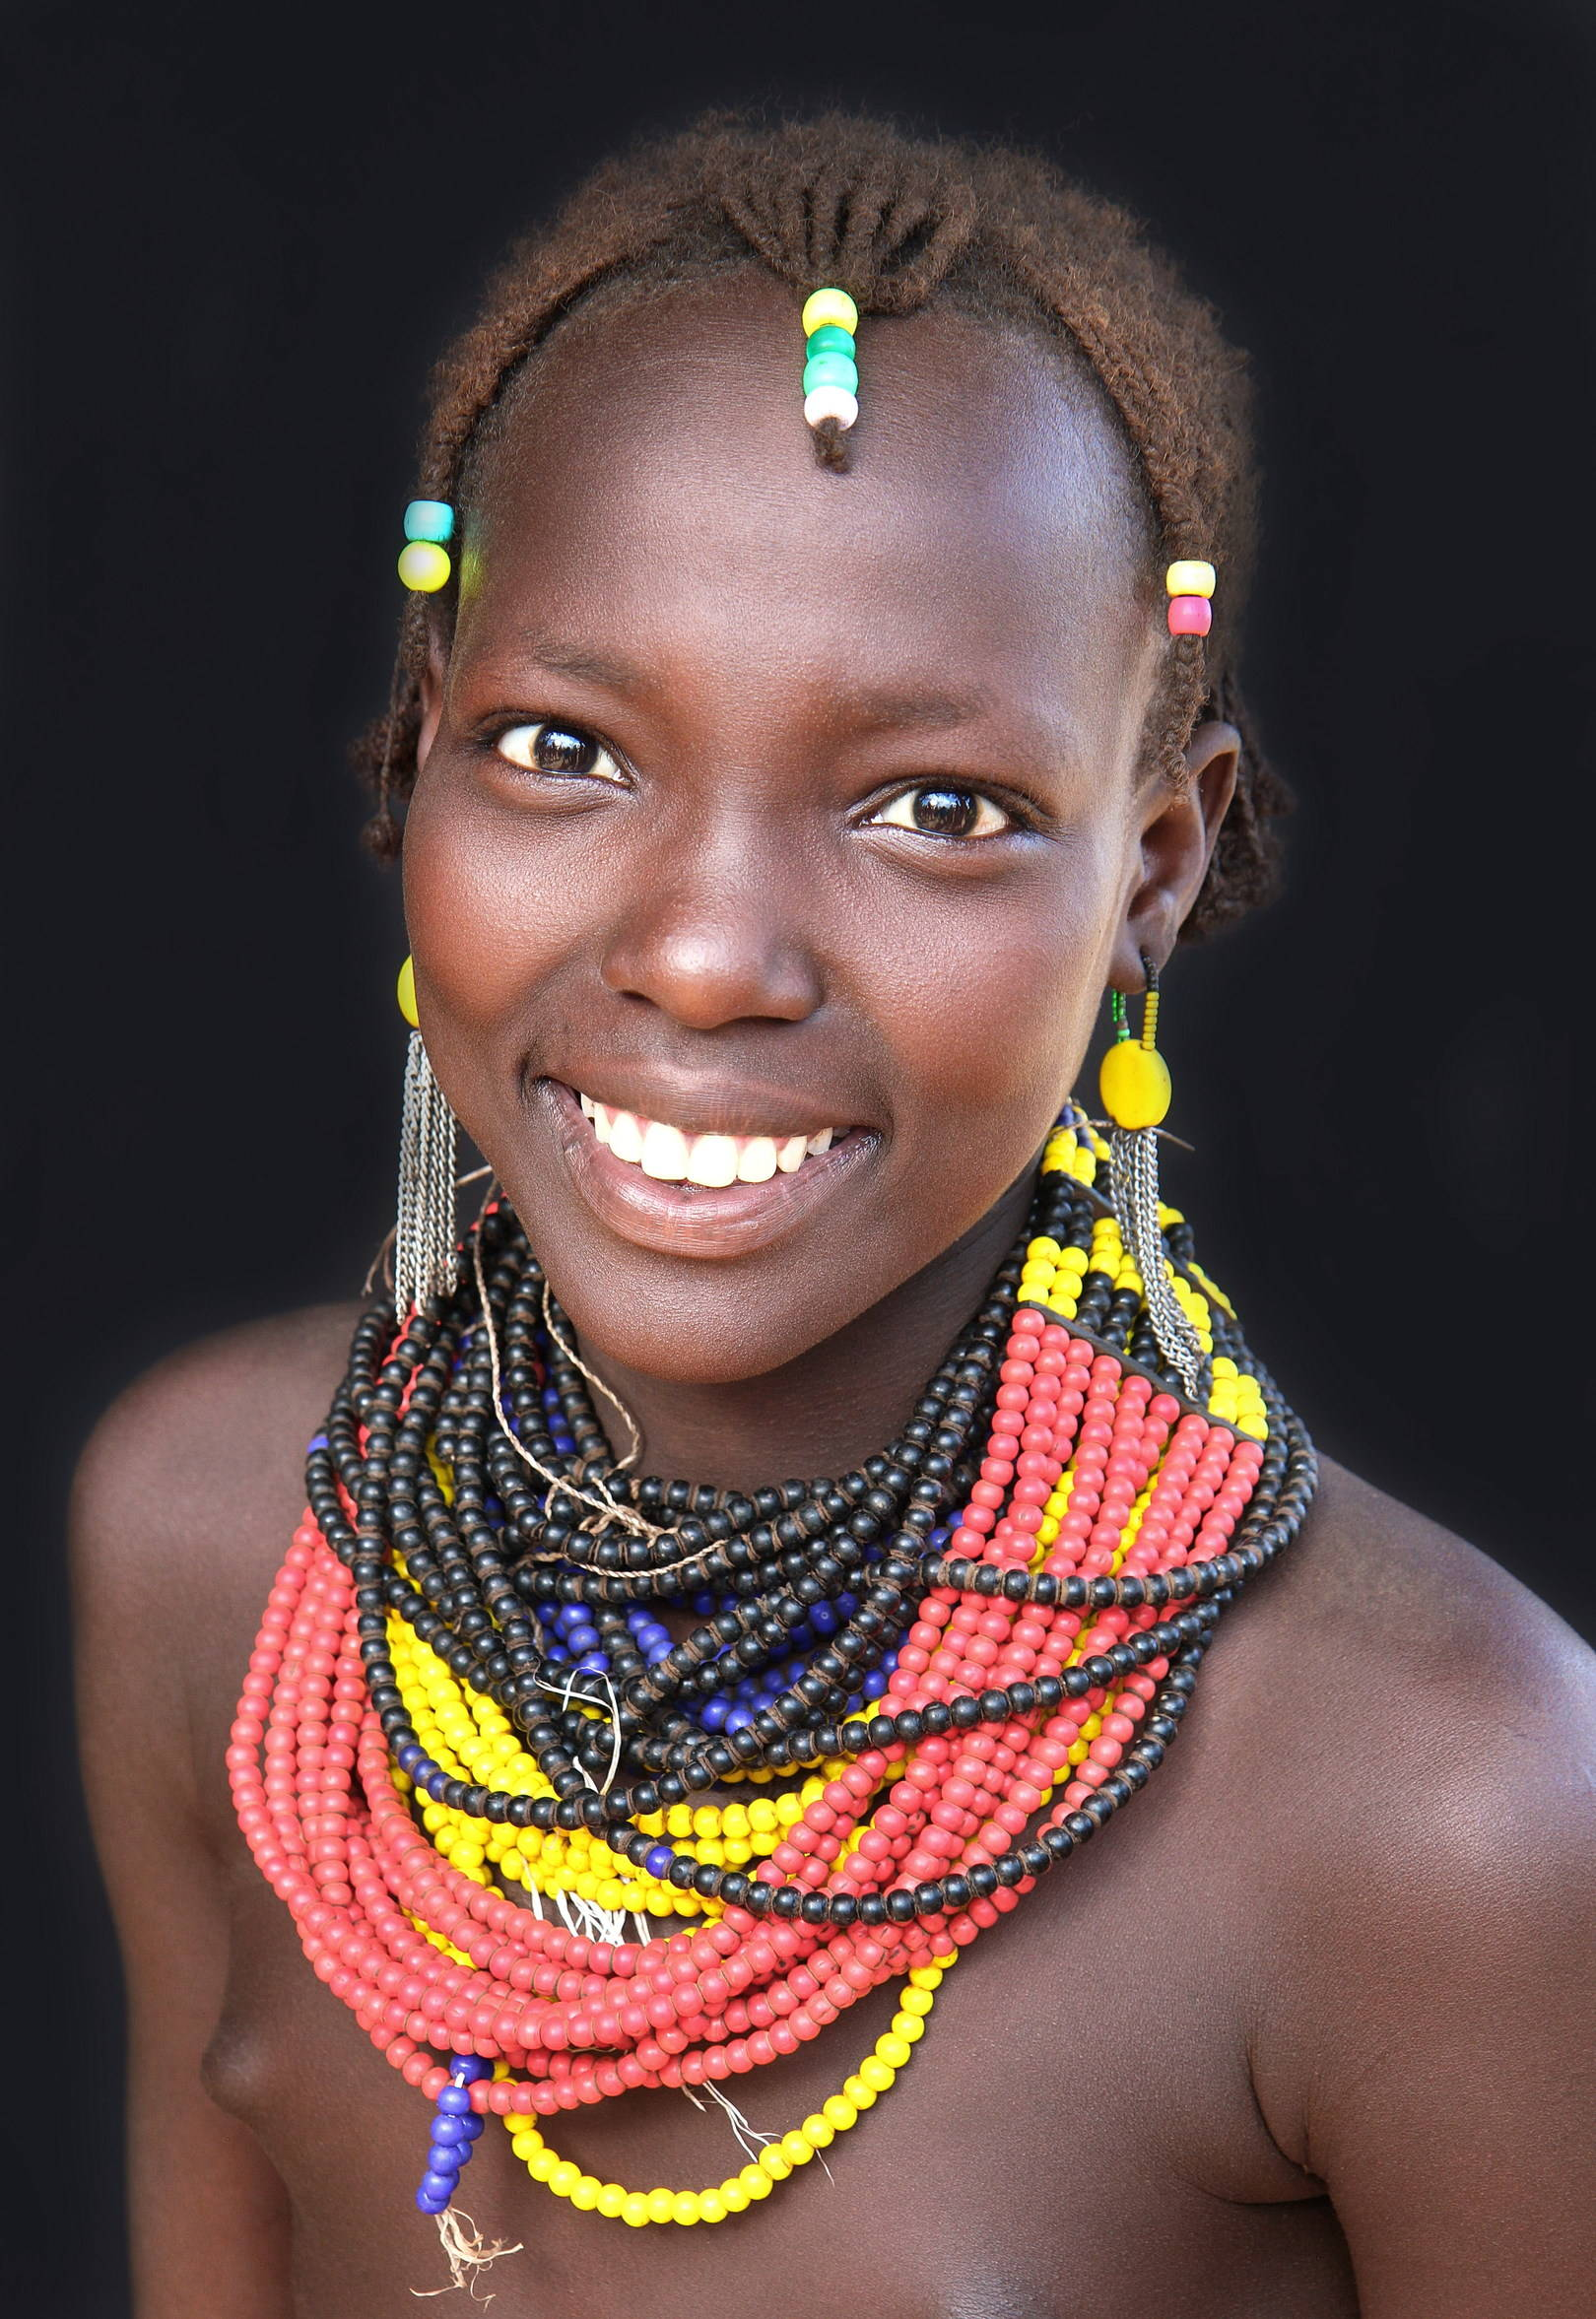 Девушка из племени Дассанеч